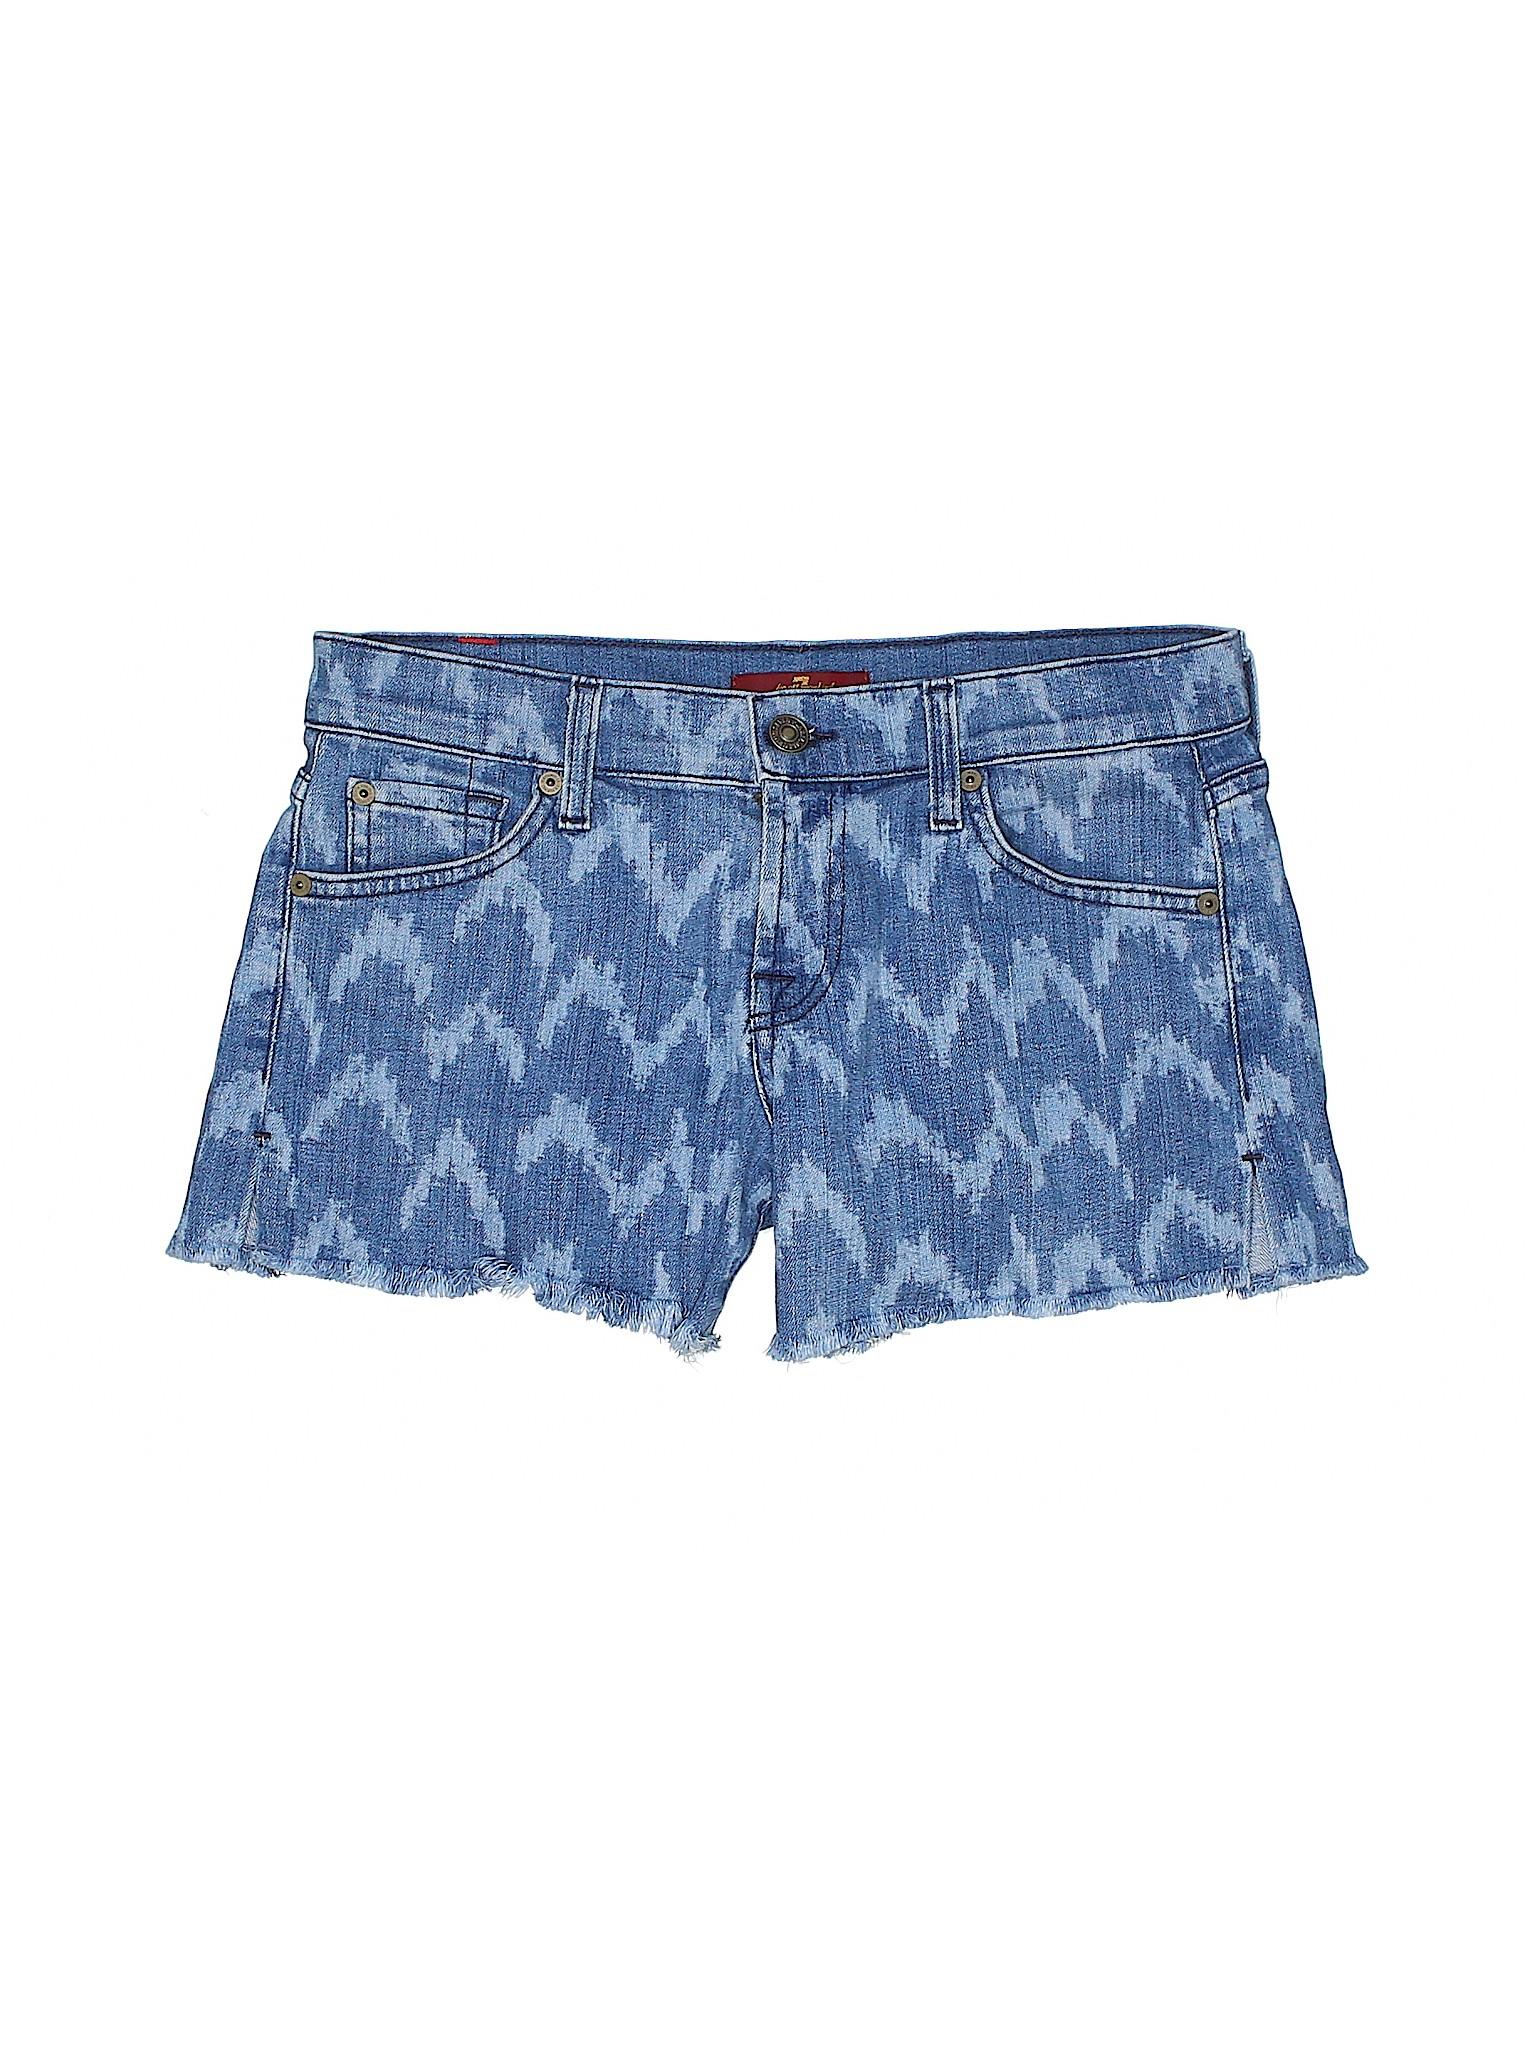 Denim 7 All Shorts For Boutique Mankind pIqxvxH